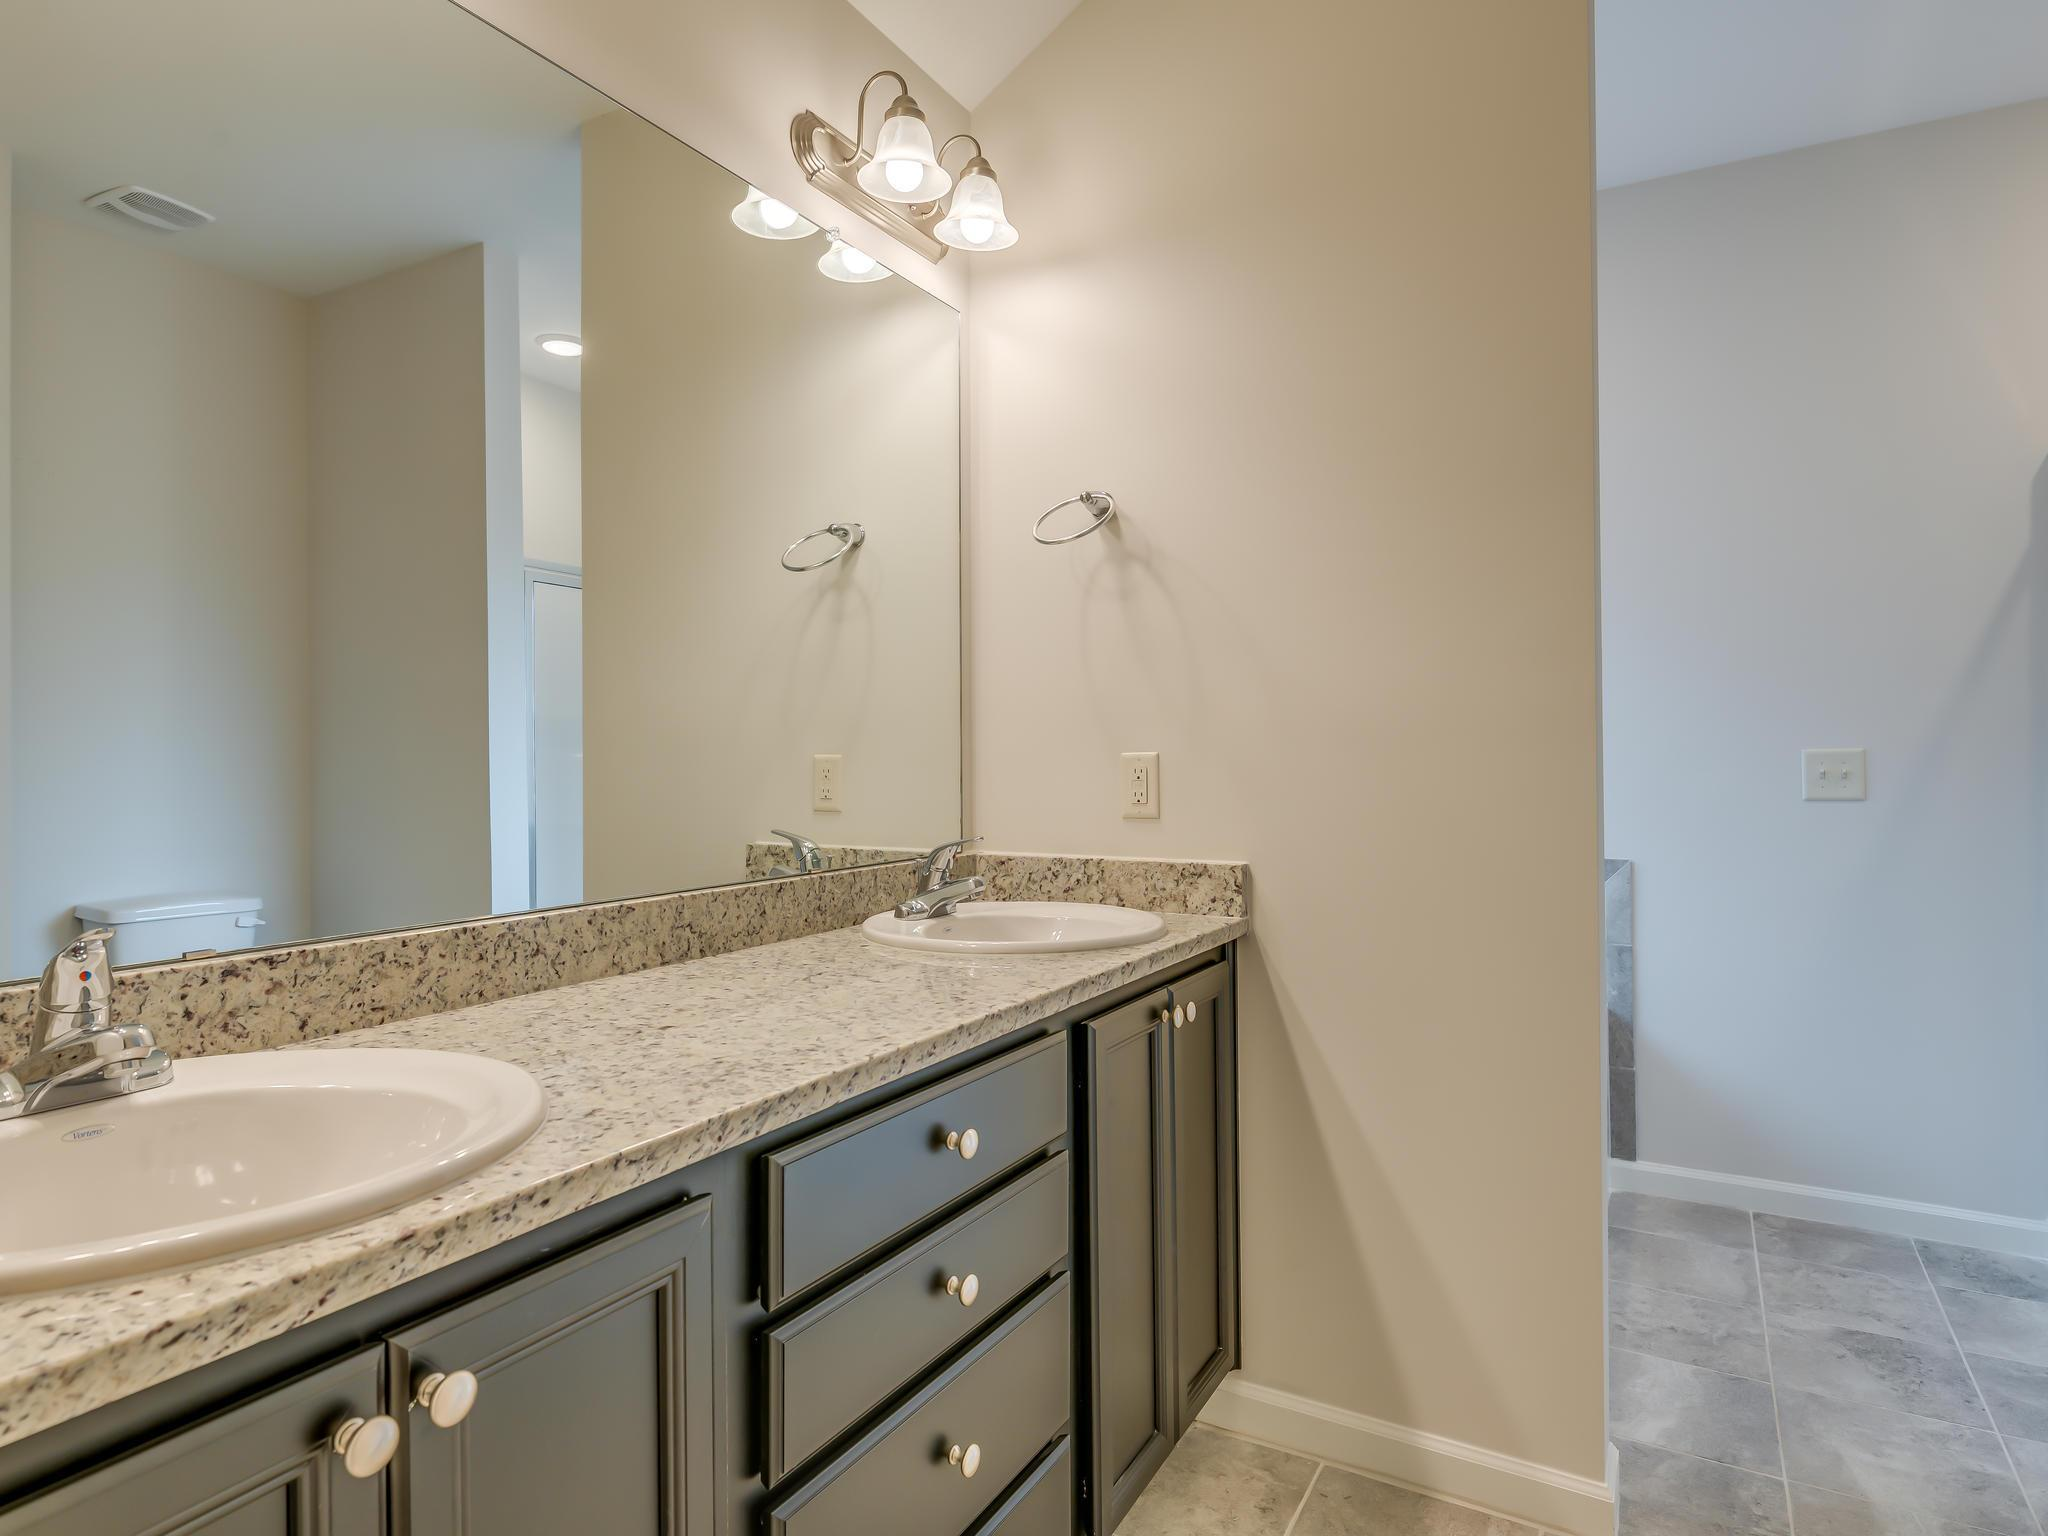 Bathroom featured in the Palmetto By Goodwyn Building in Montgomery, AL